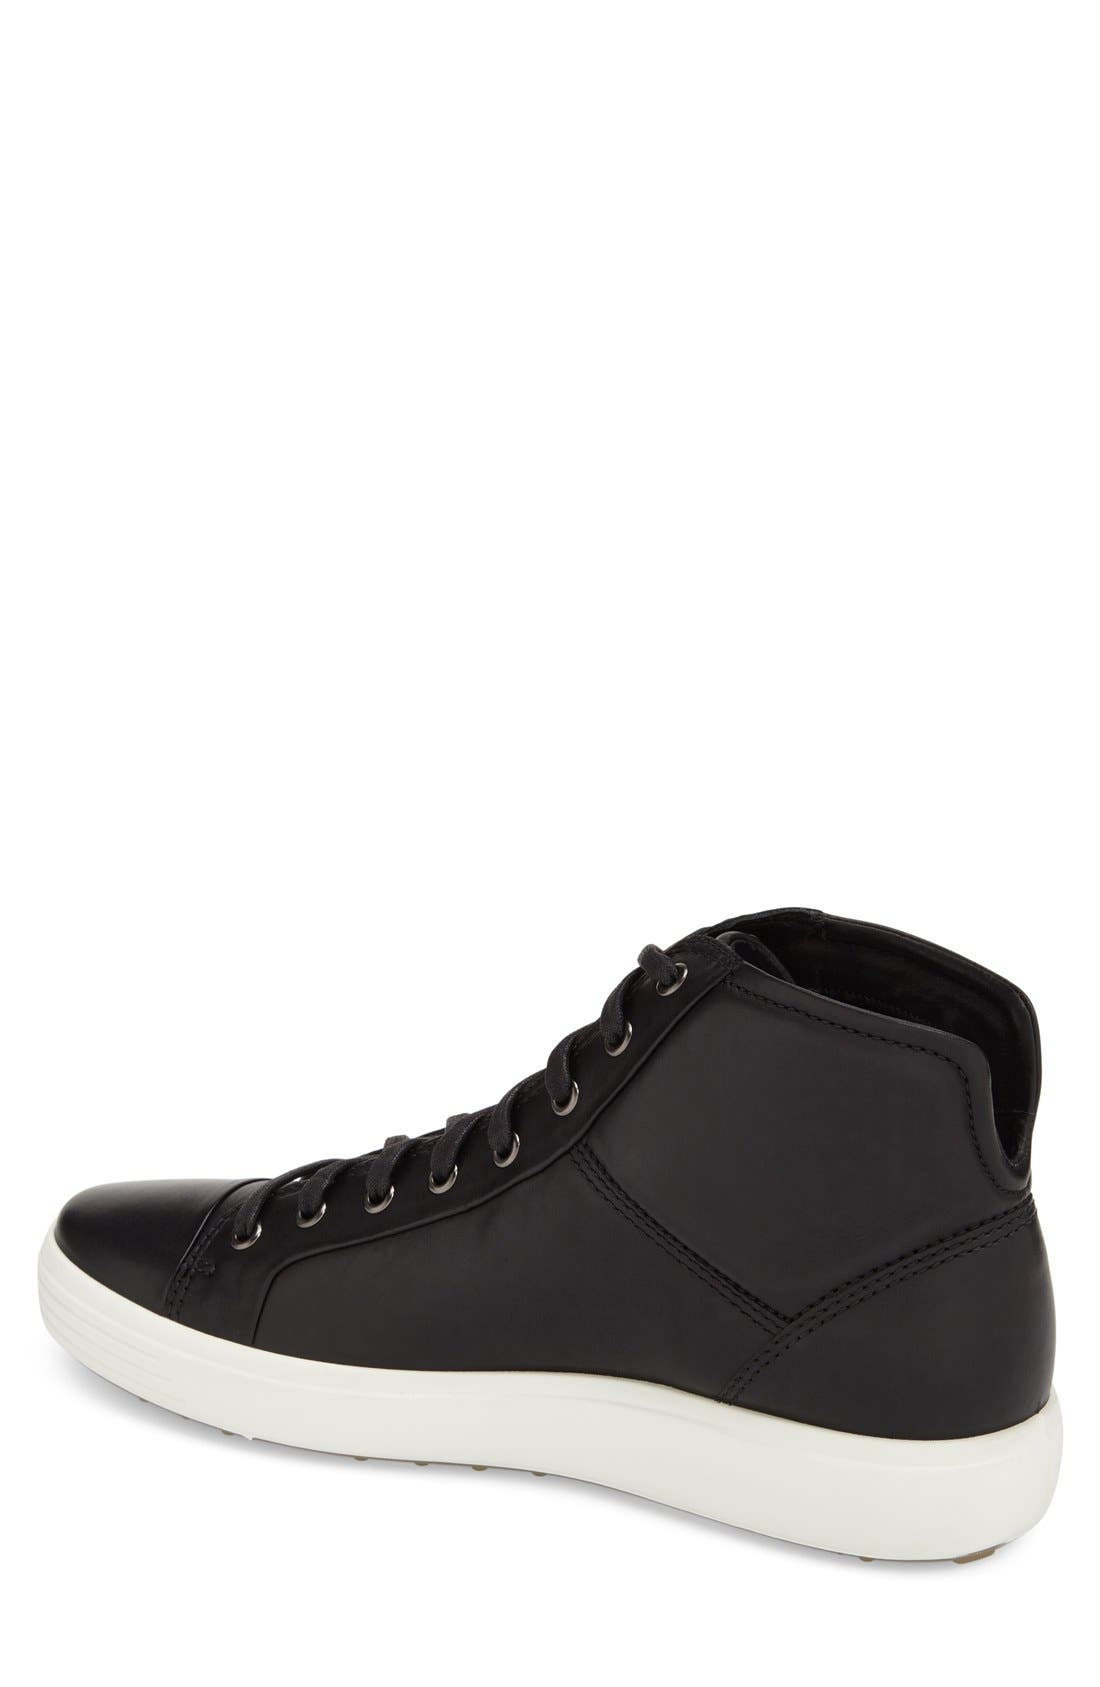 8e6718e9b5c330 Men s Sneakers